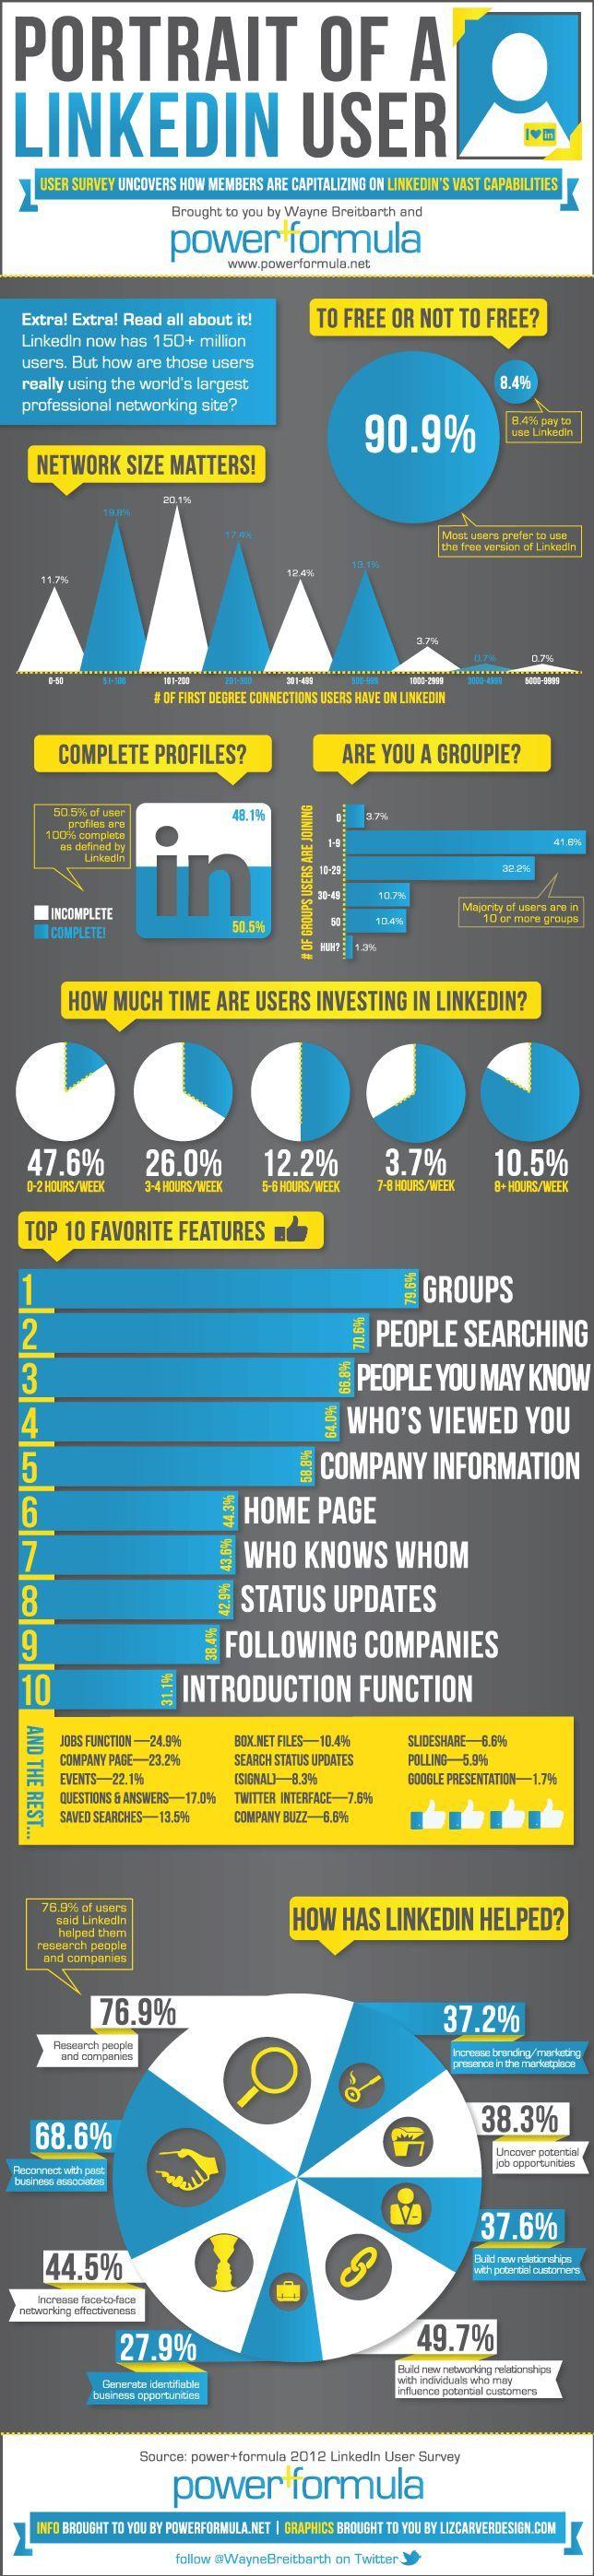 nice Wayne Breitbarth's Blog on Linkedin Tips – Power Formula for LinkedIn